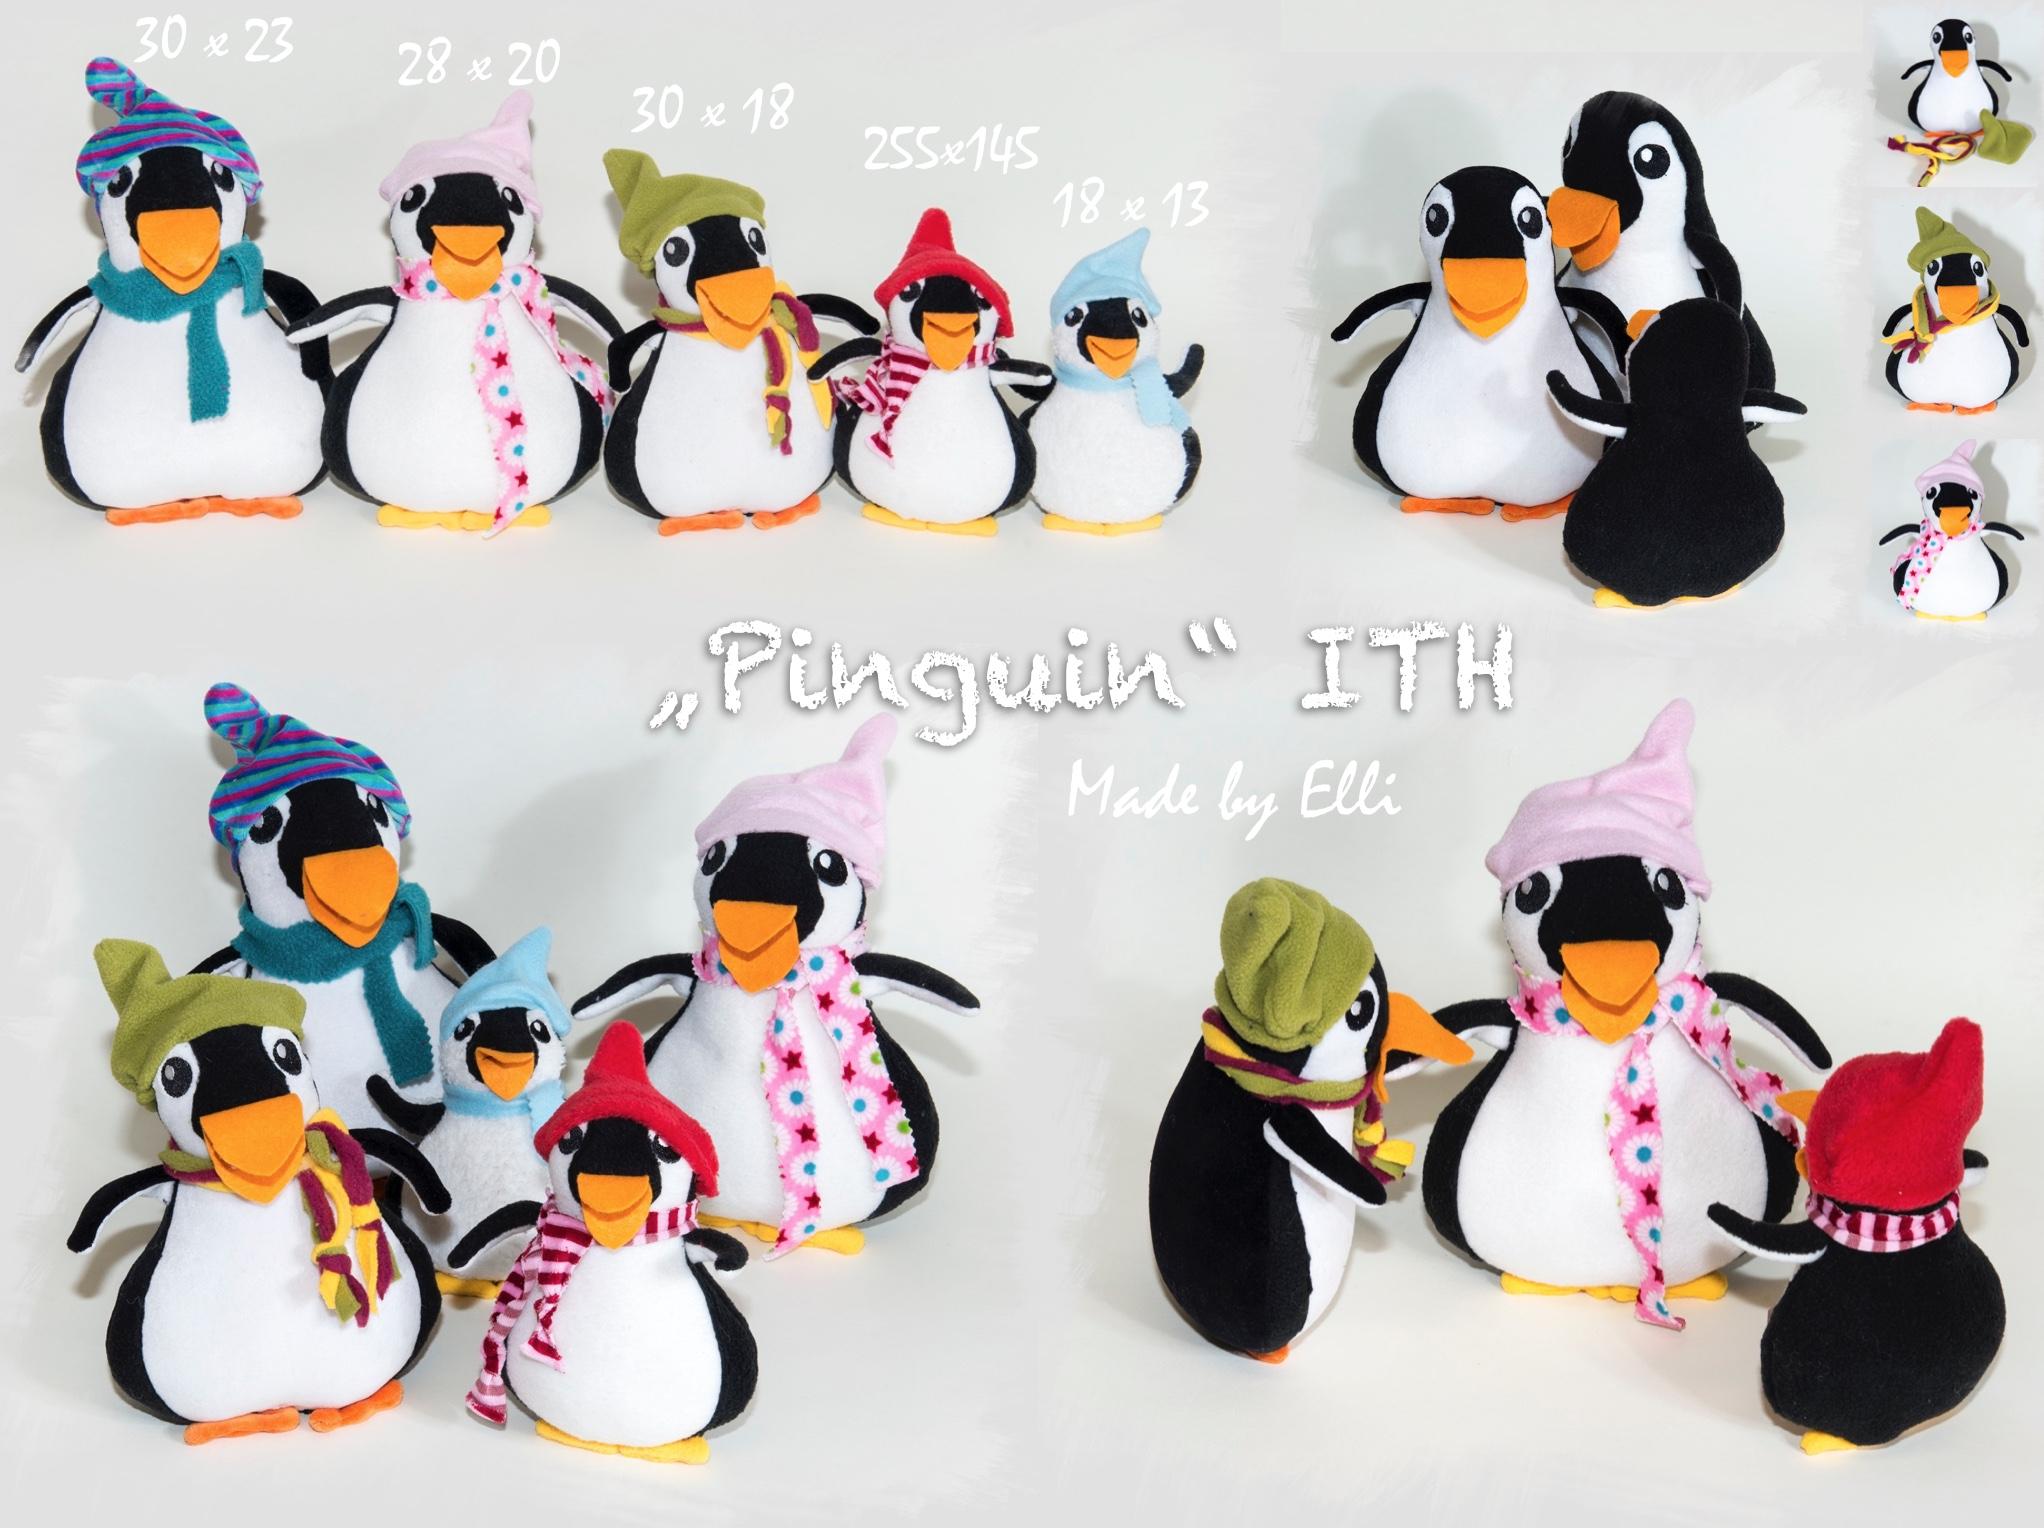 Pinguin ITH